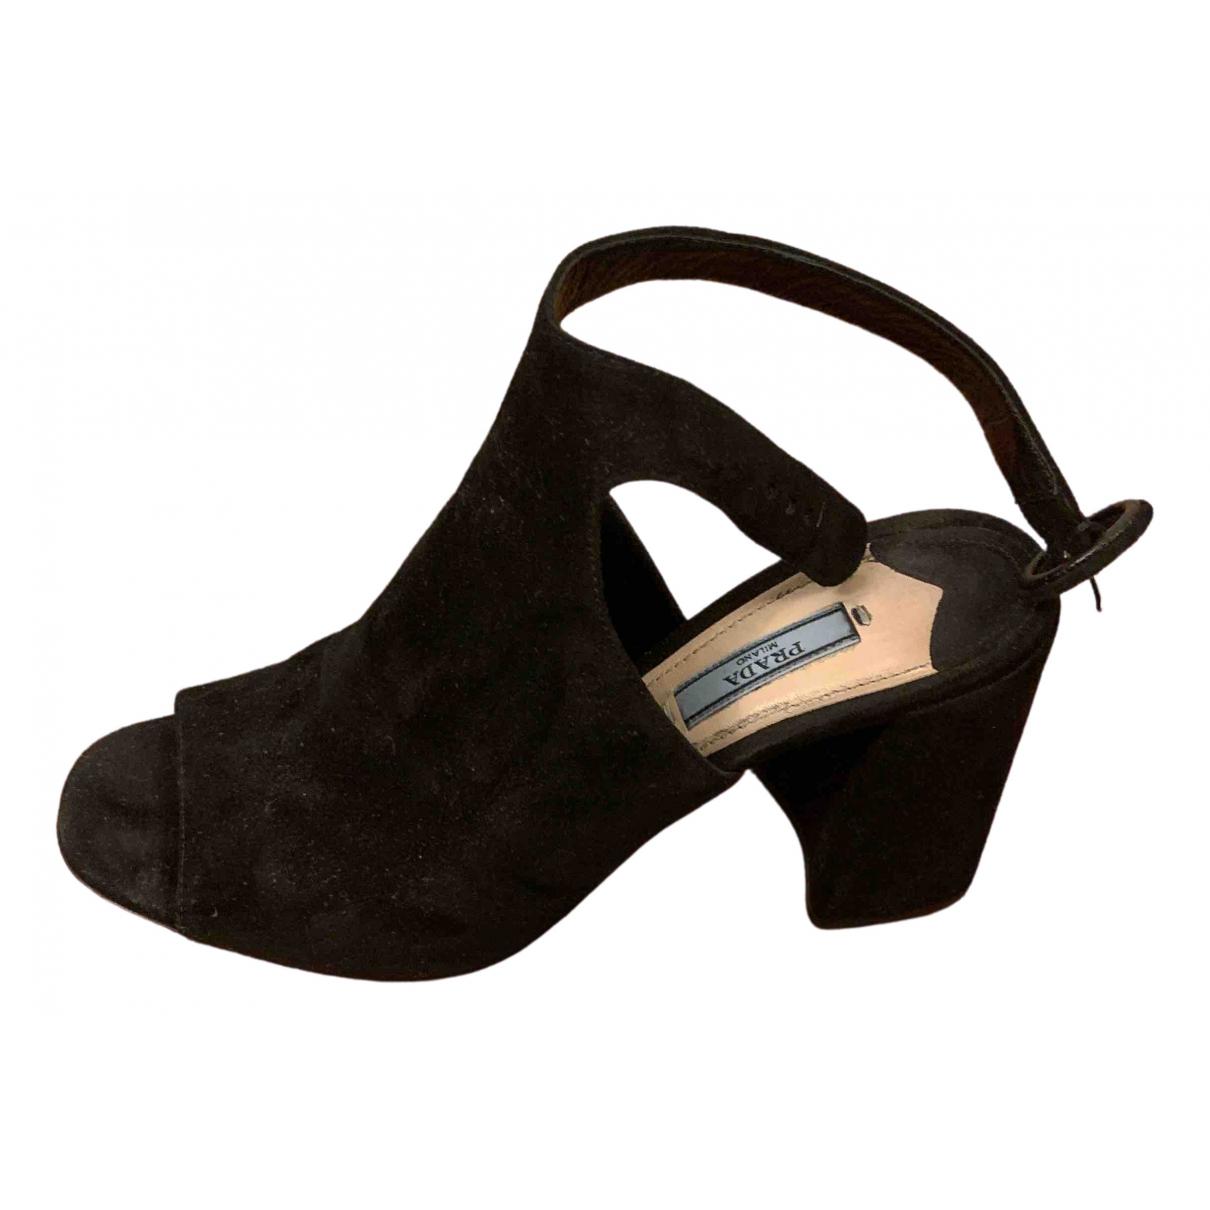 Prada \N Black Suede Sandals for Women 38.5 EU